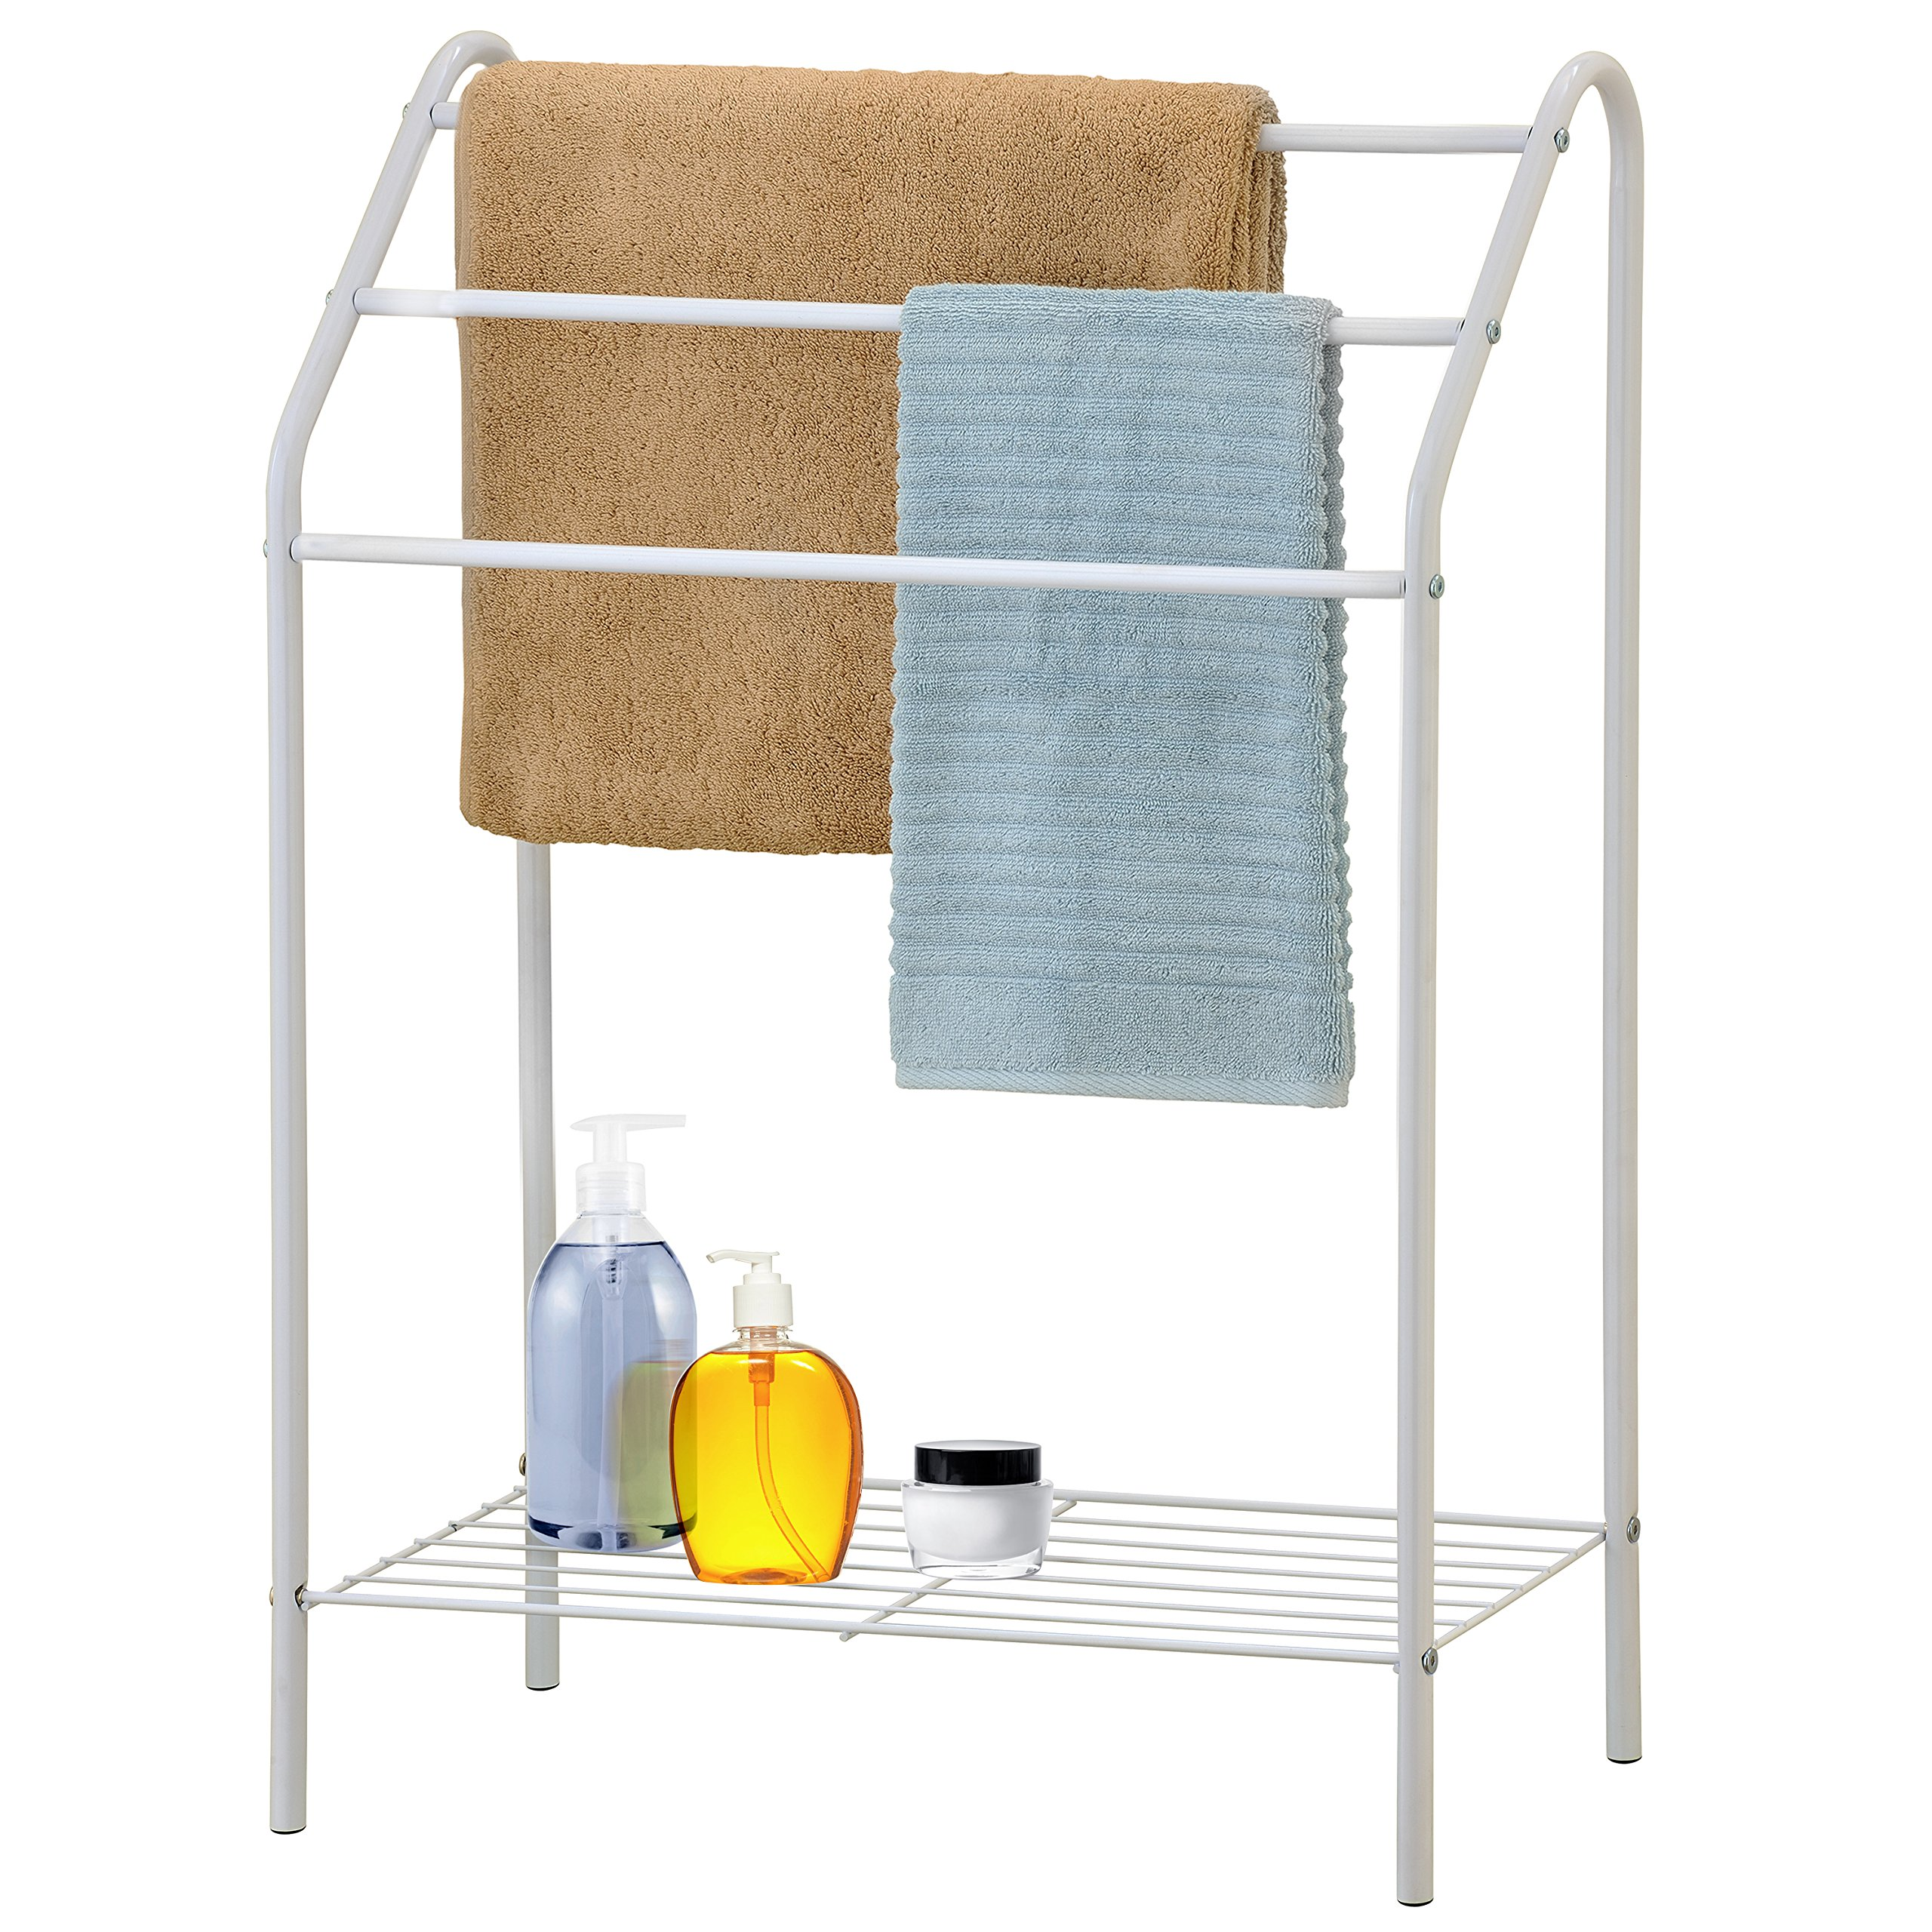 Cheap Towel Rack Freestanding, find Towel Rack Freestanding deals on ...